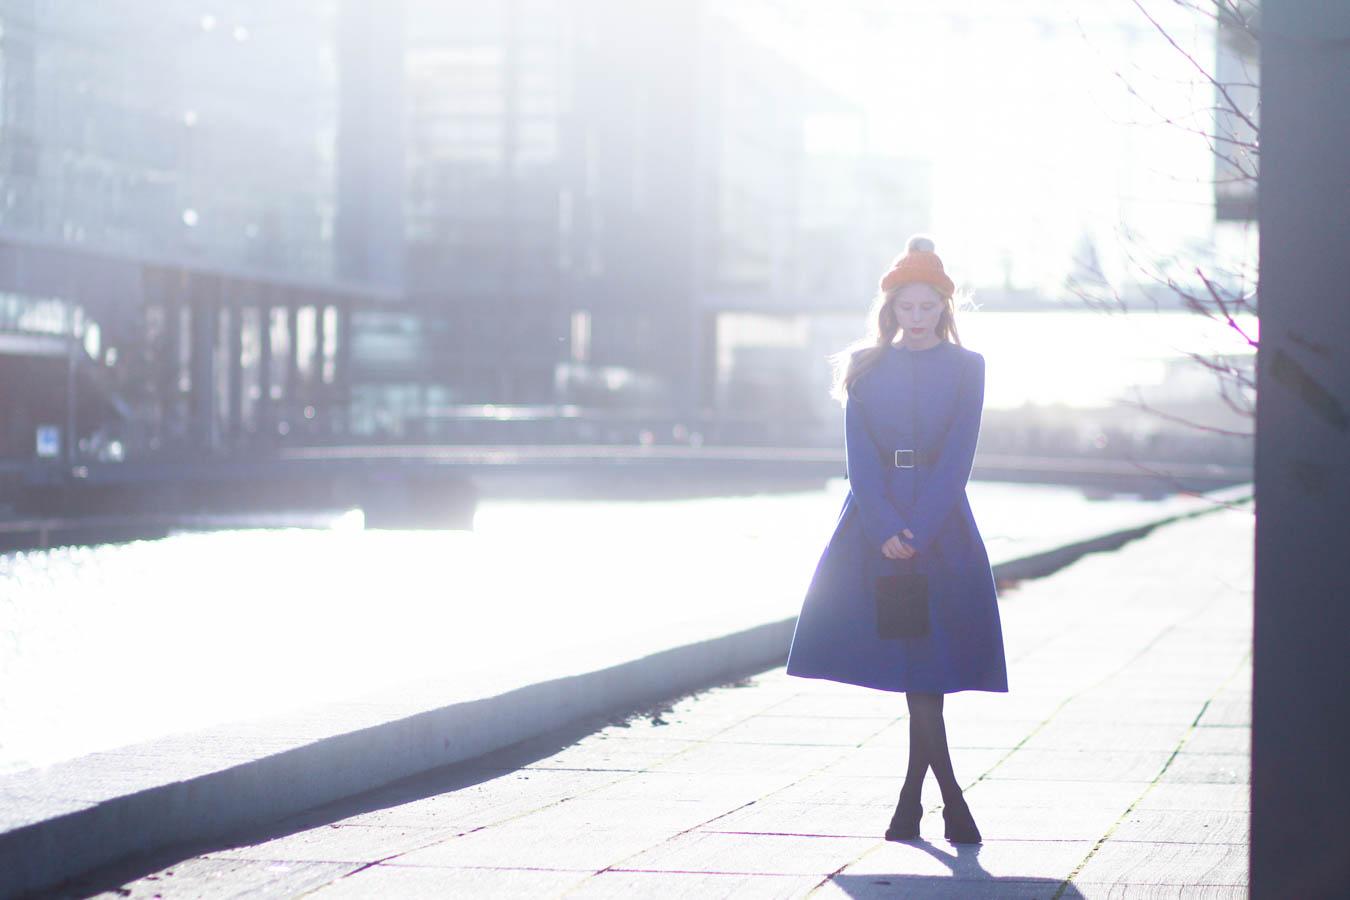 outfit December nemesis babe marie jensen danish blogger -5-2